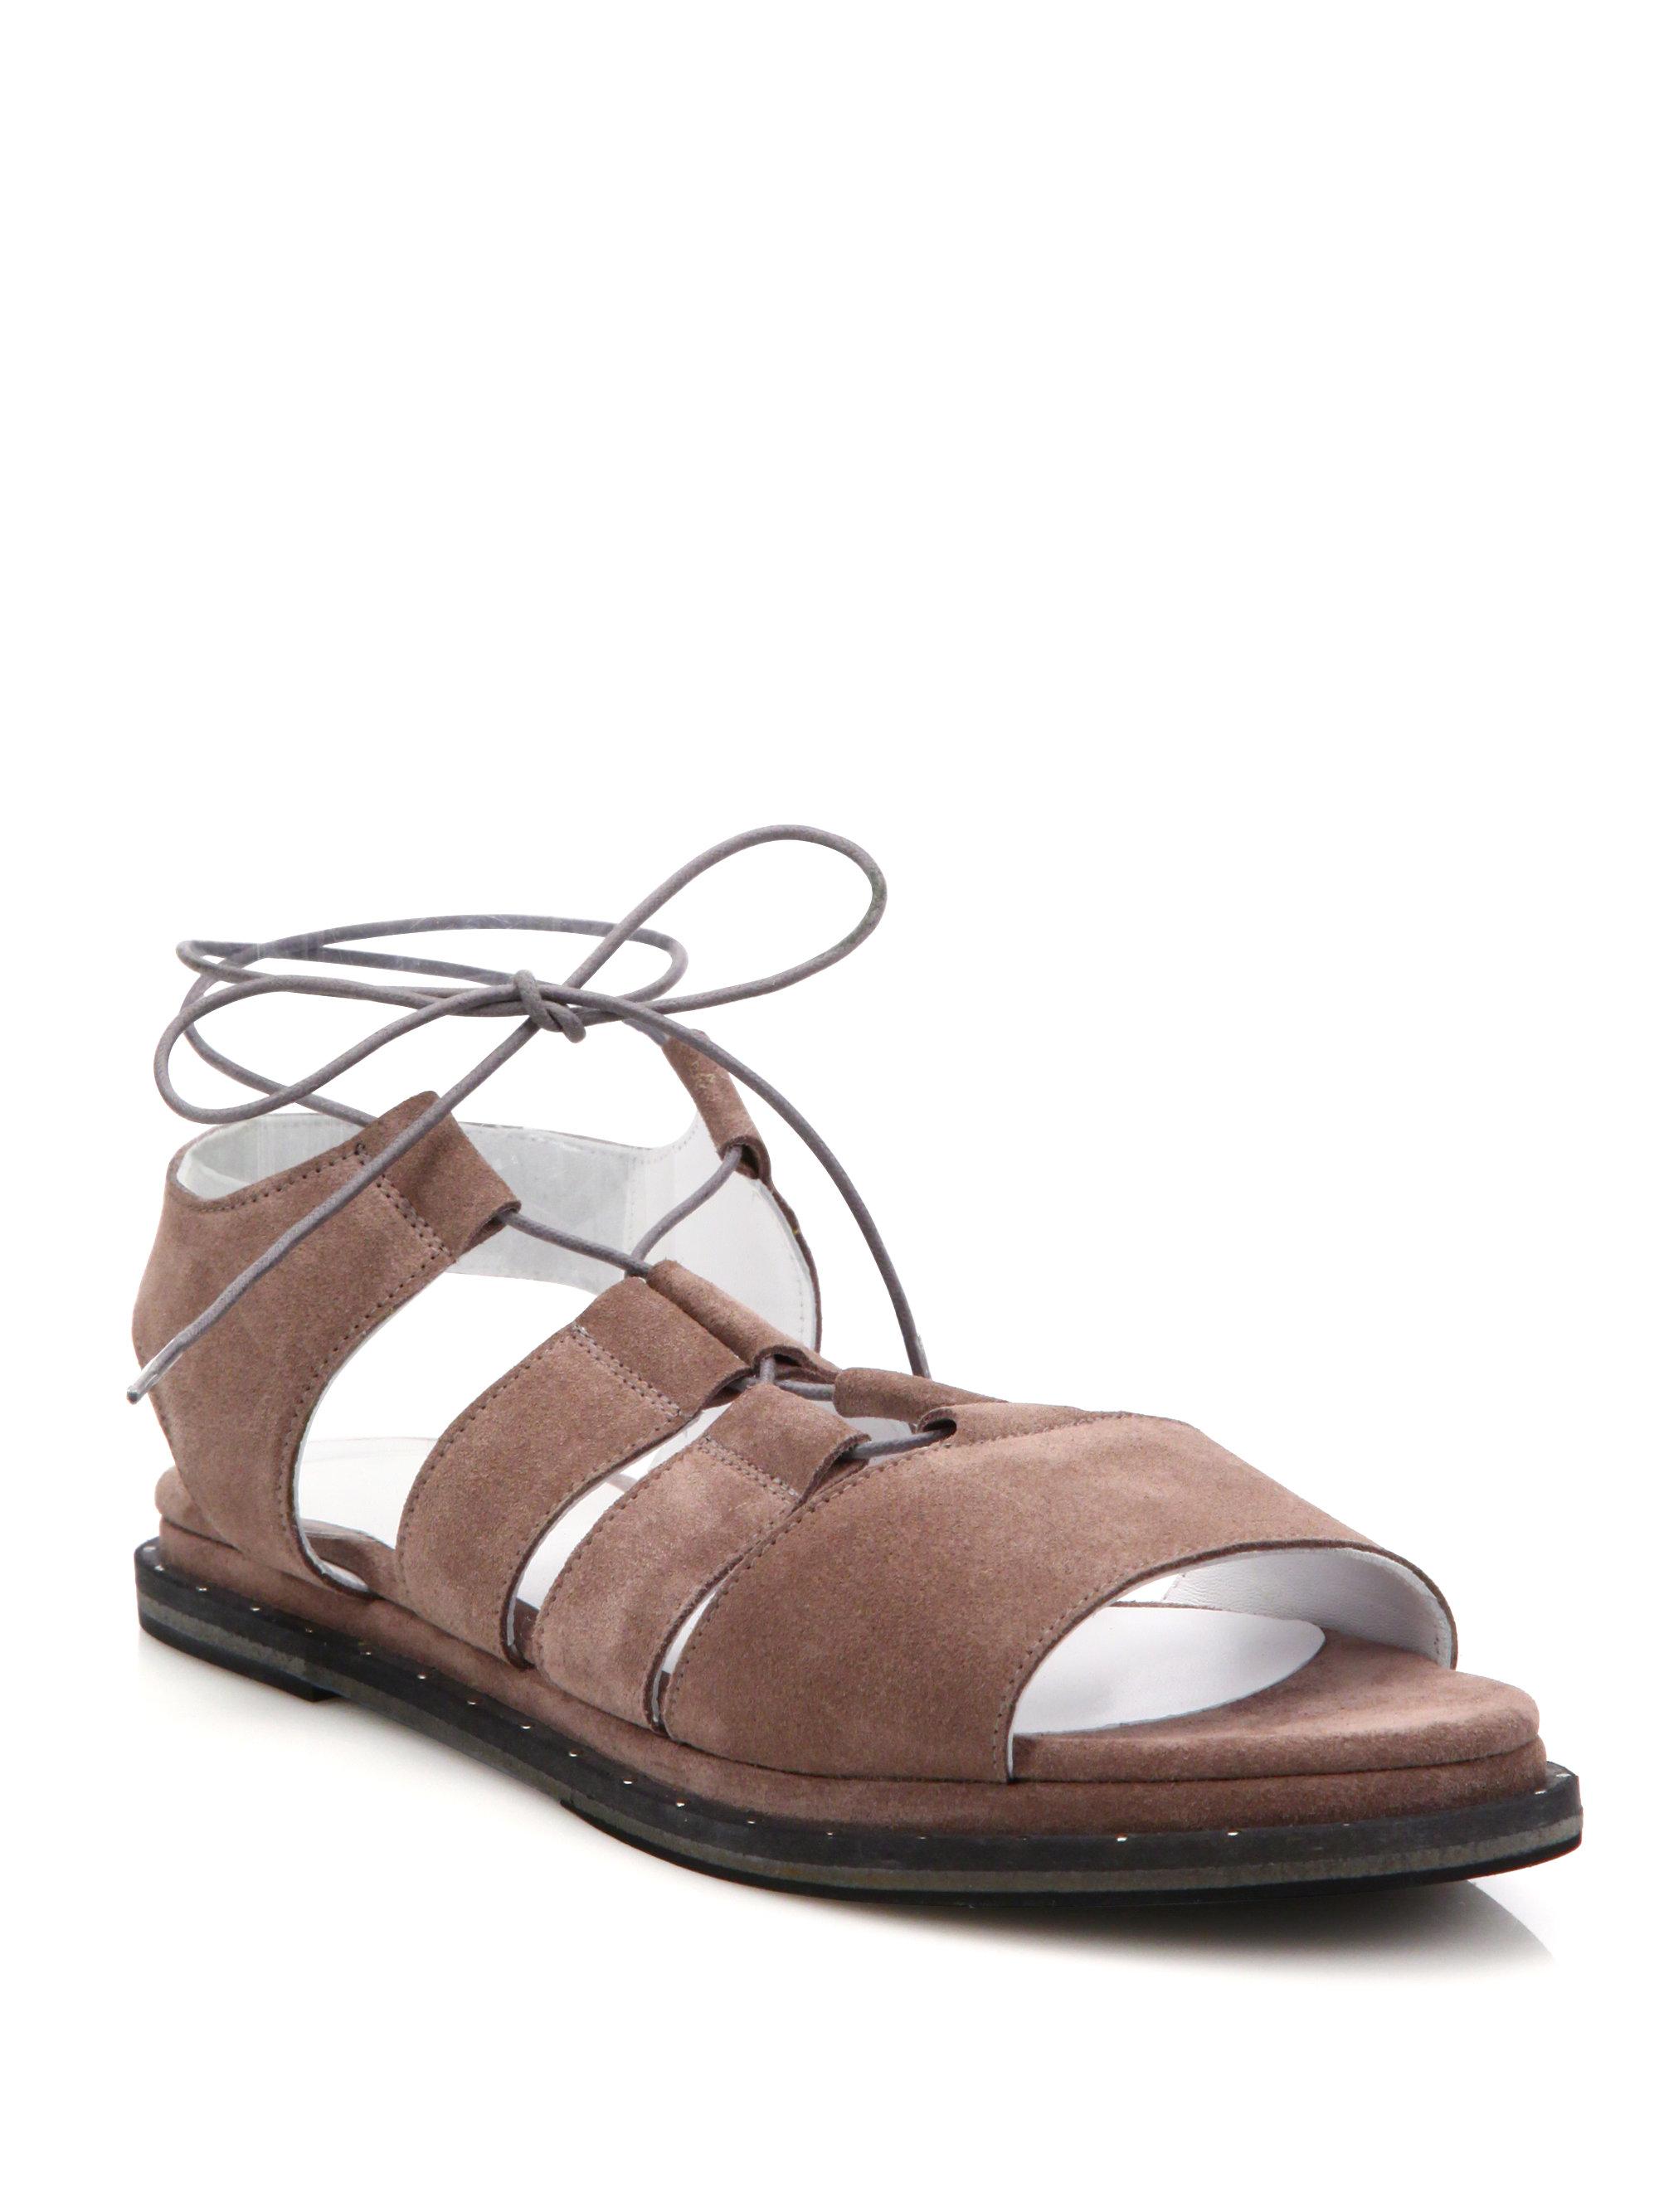 7024bc02266 Lyst - Frēda Salvador Wise Suede Ghillie Gladiator Sandals in Brown